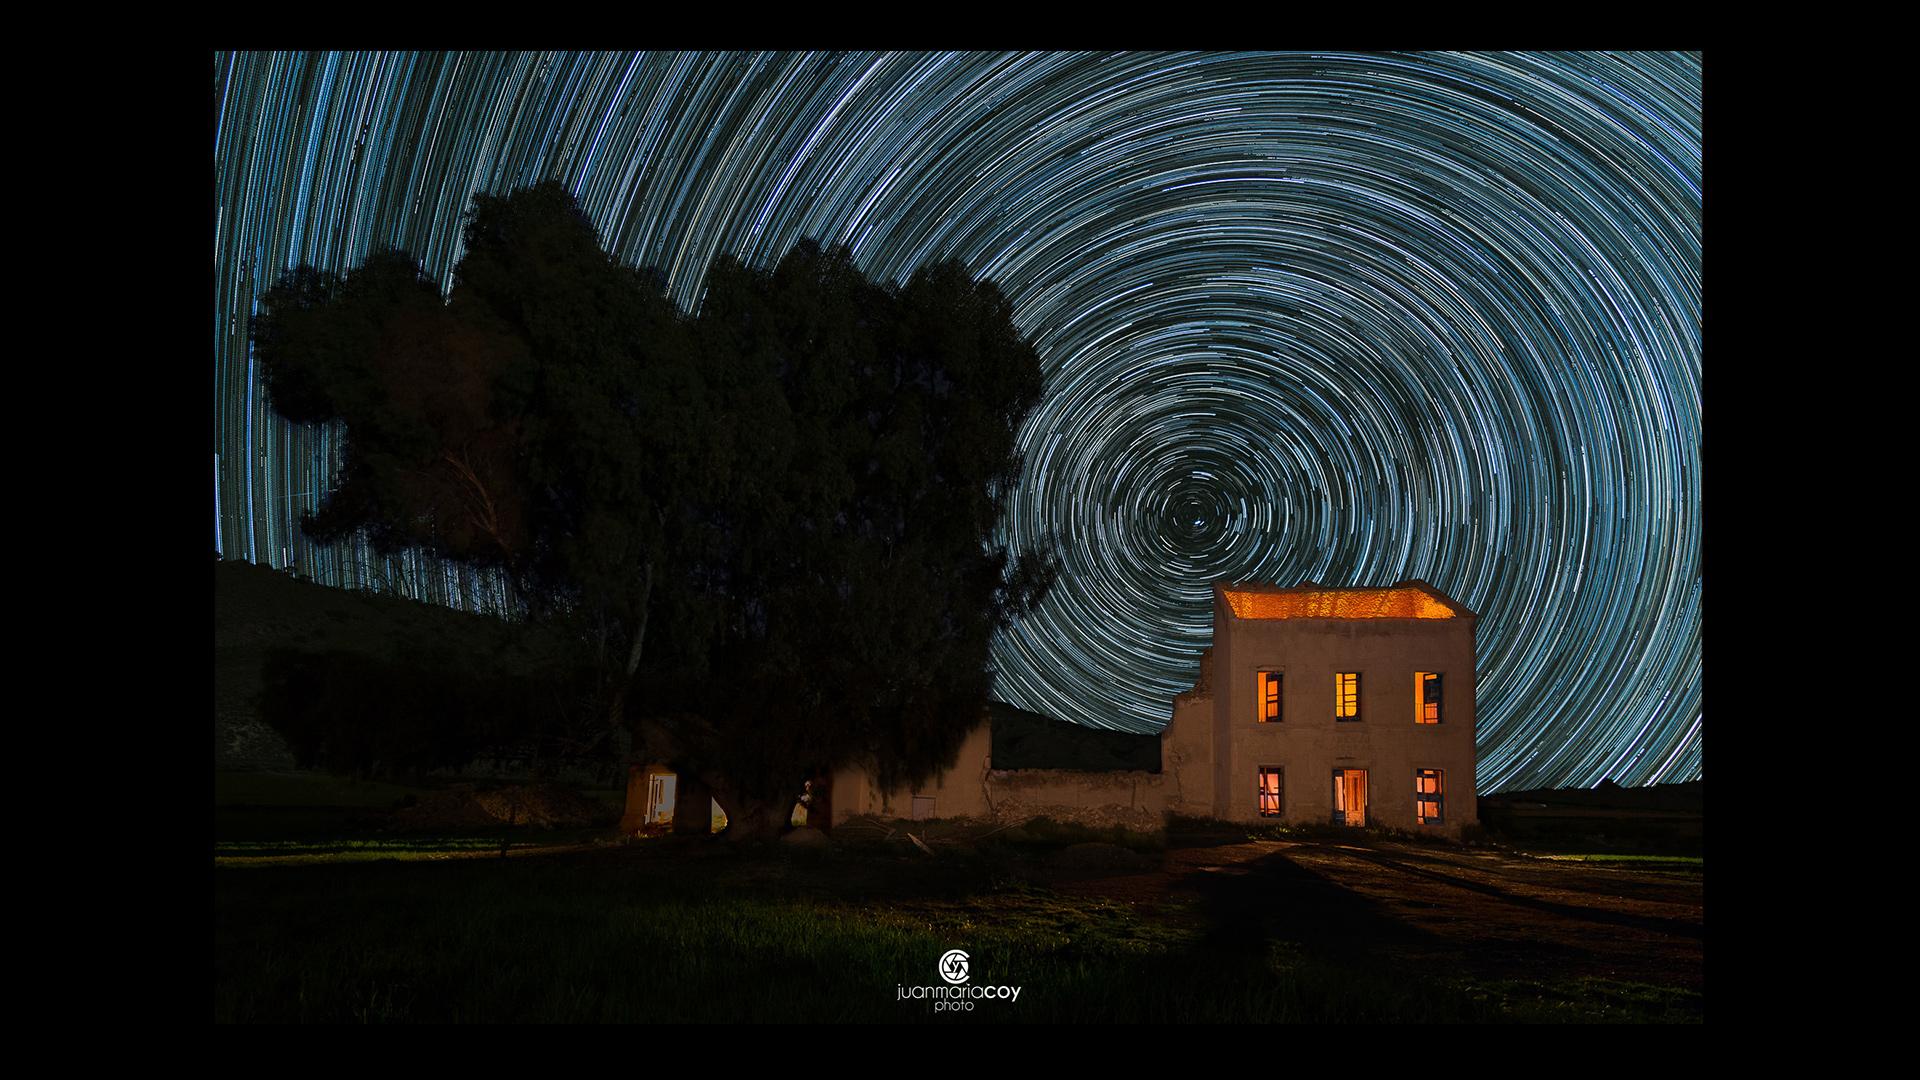 Photofocus Photographer of the Day Juan Maria Coy Star Trail Tobarra Spain